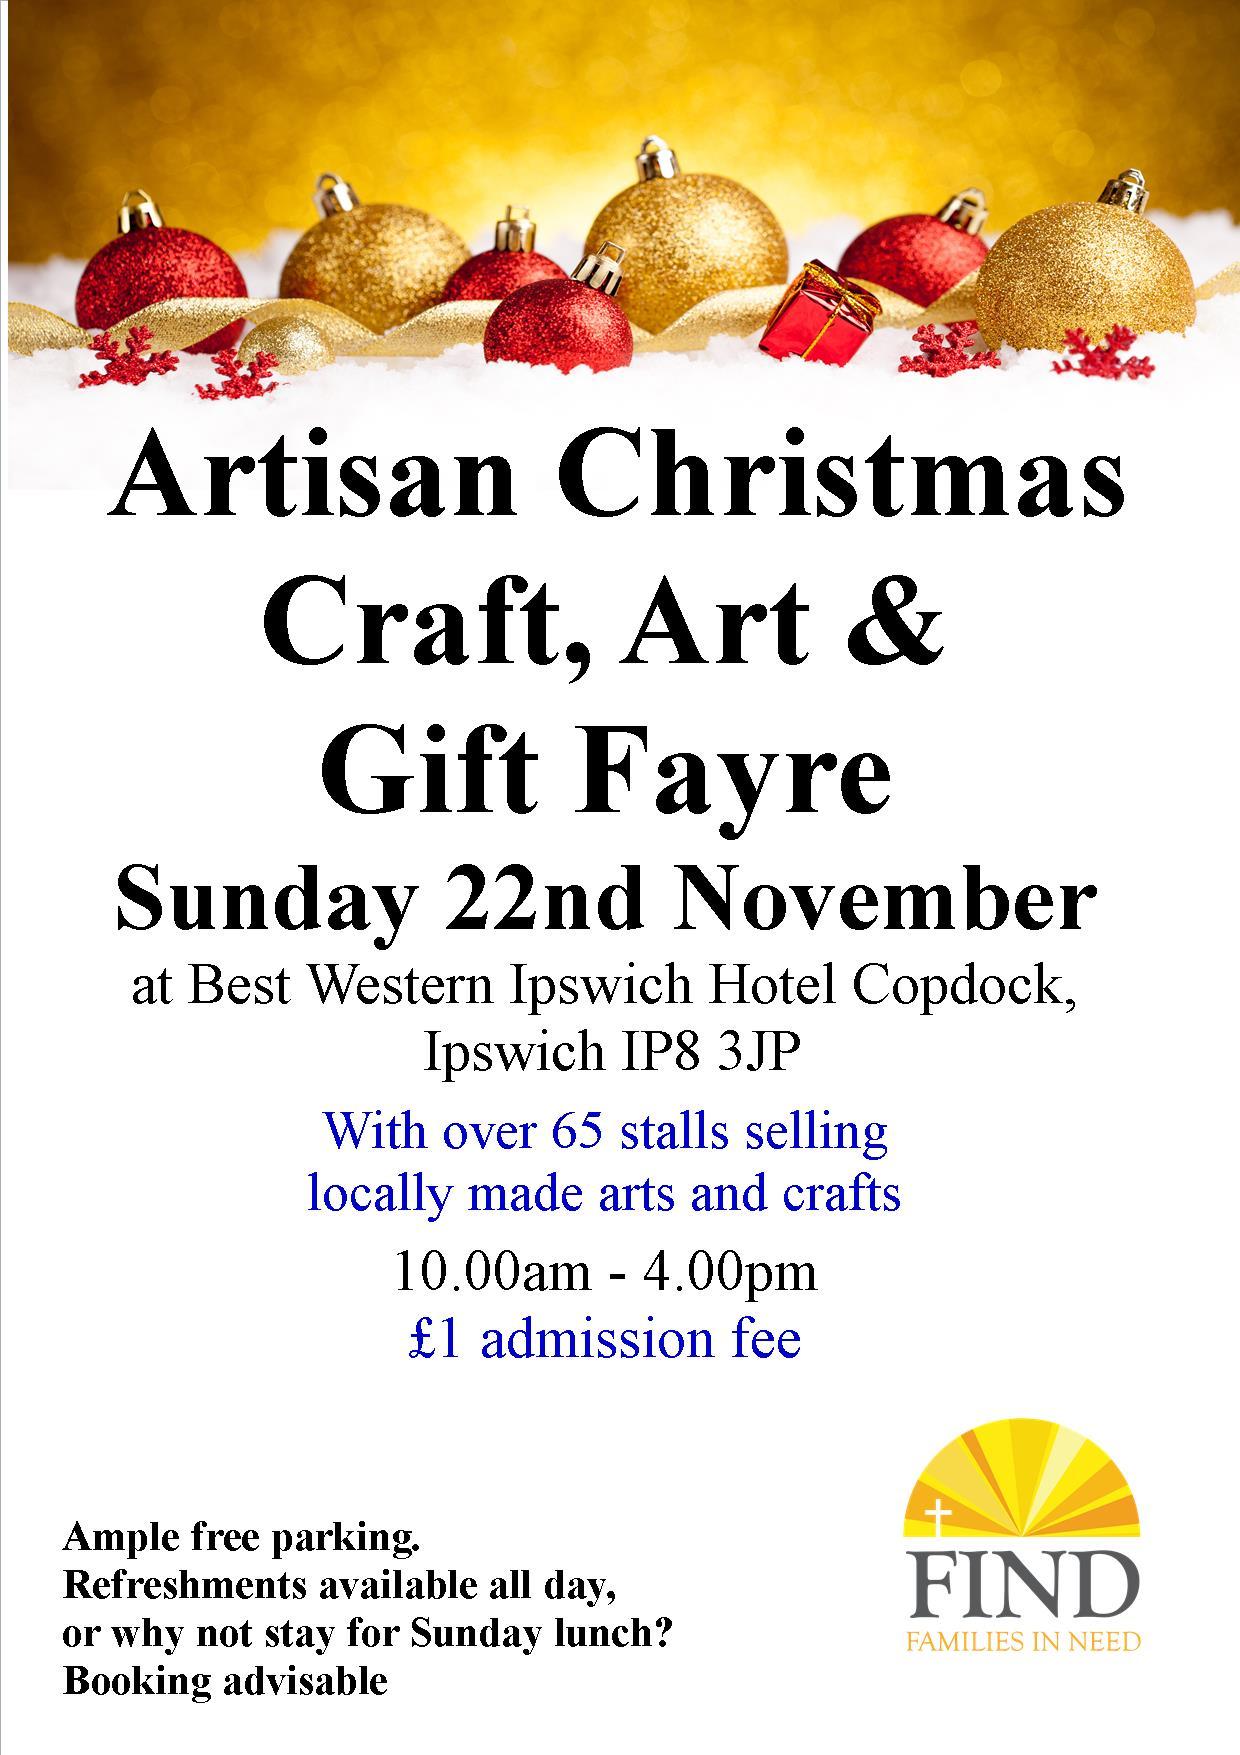 Artisan Christmas Craft, Art & Gift Fayre